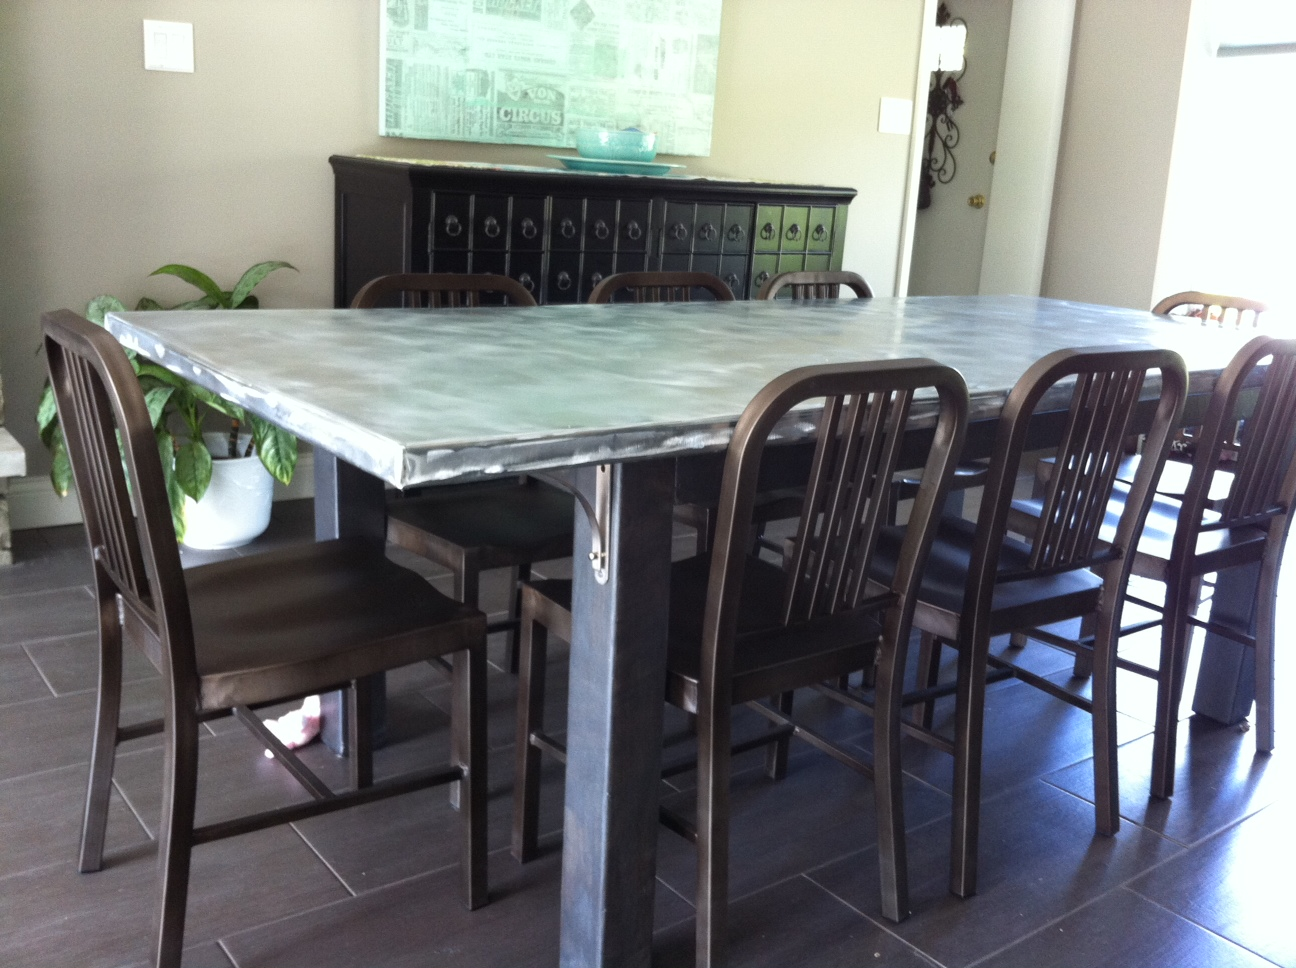 diy-dining-room-zinc-table-16388627425-o.jpg